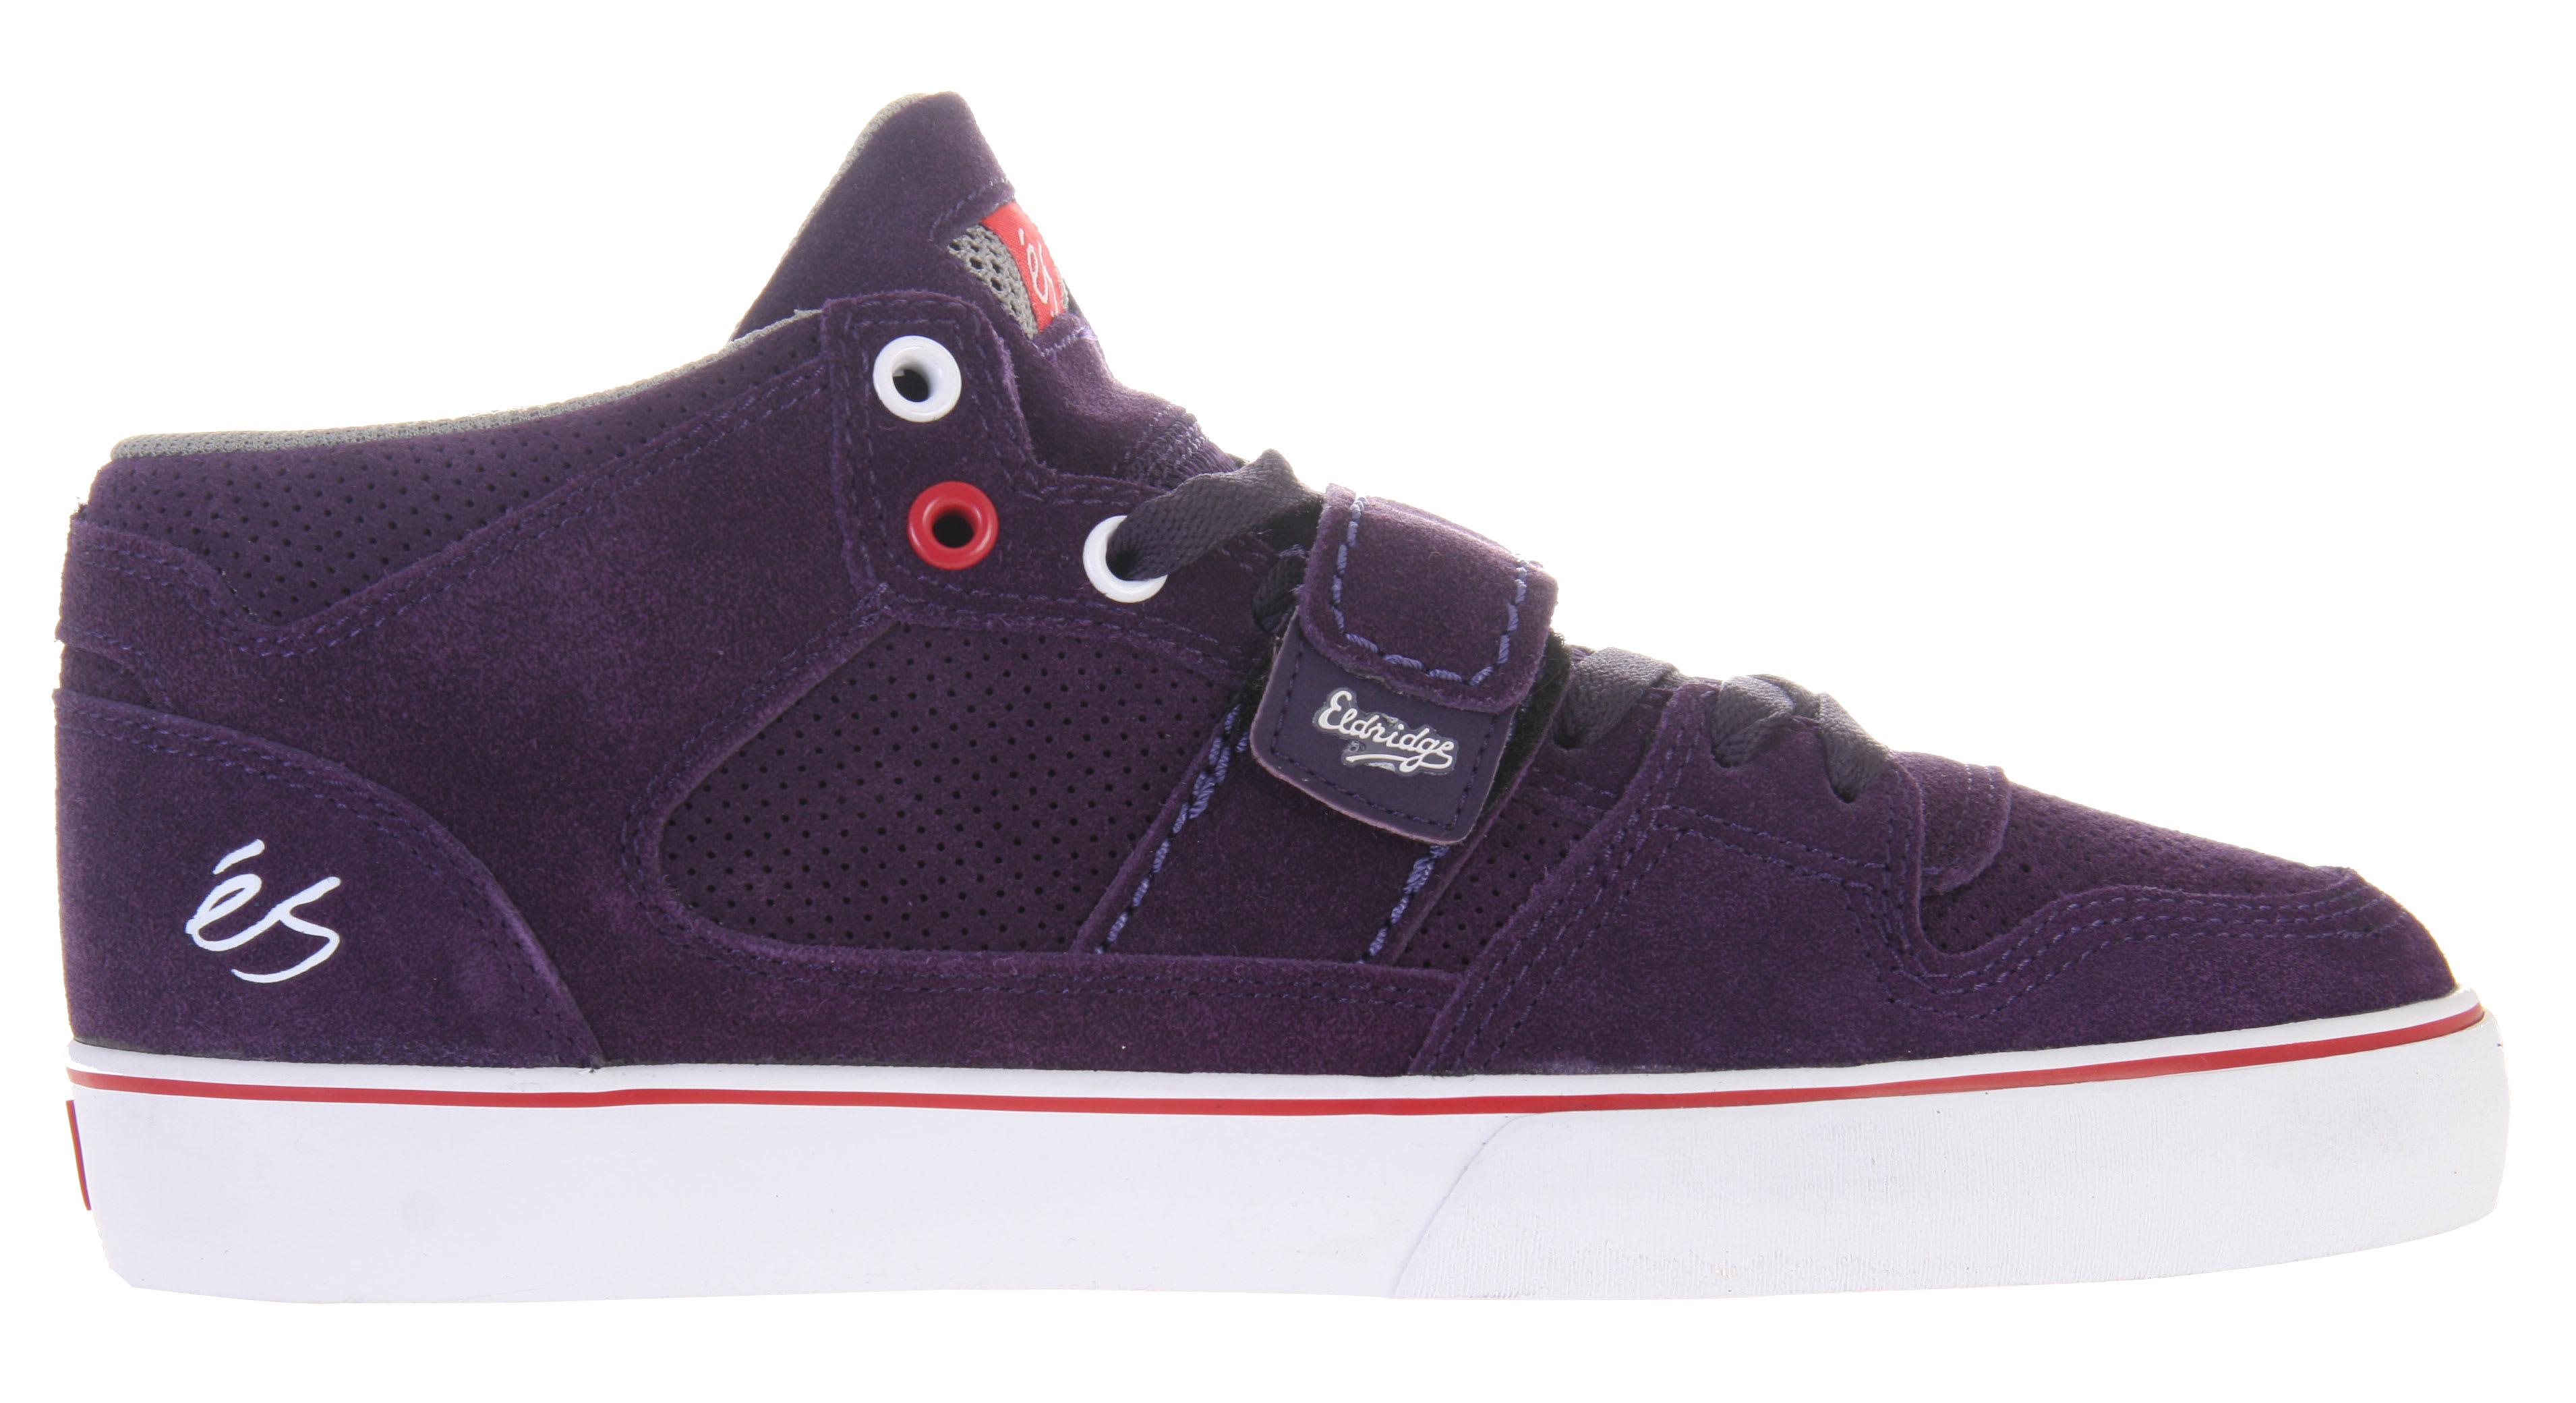 Theory Skate Shop Shoes